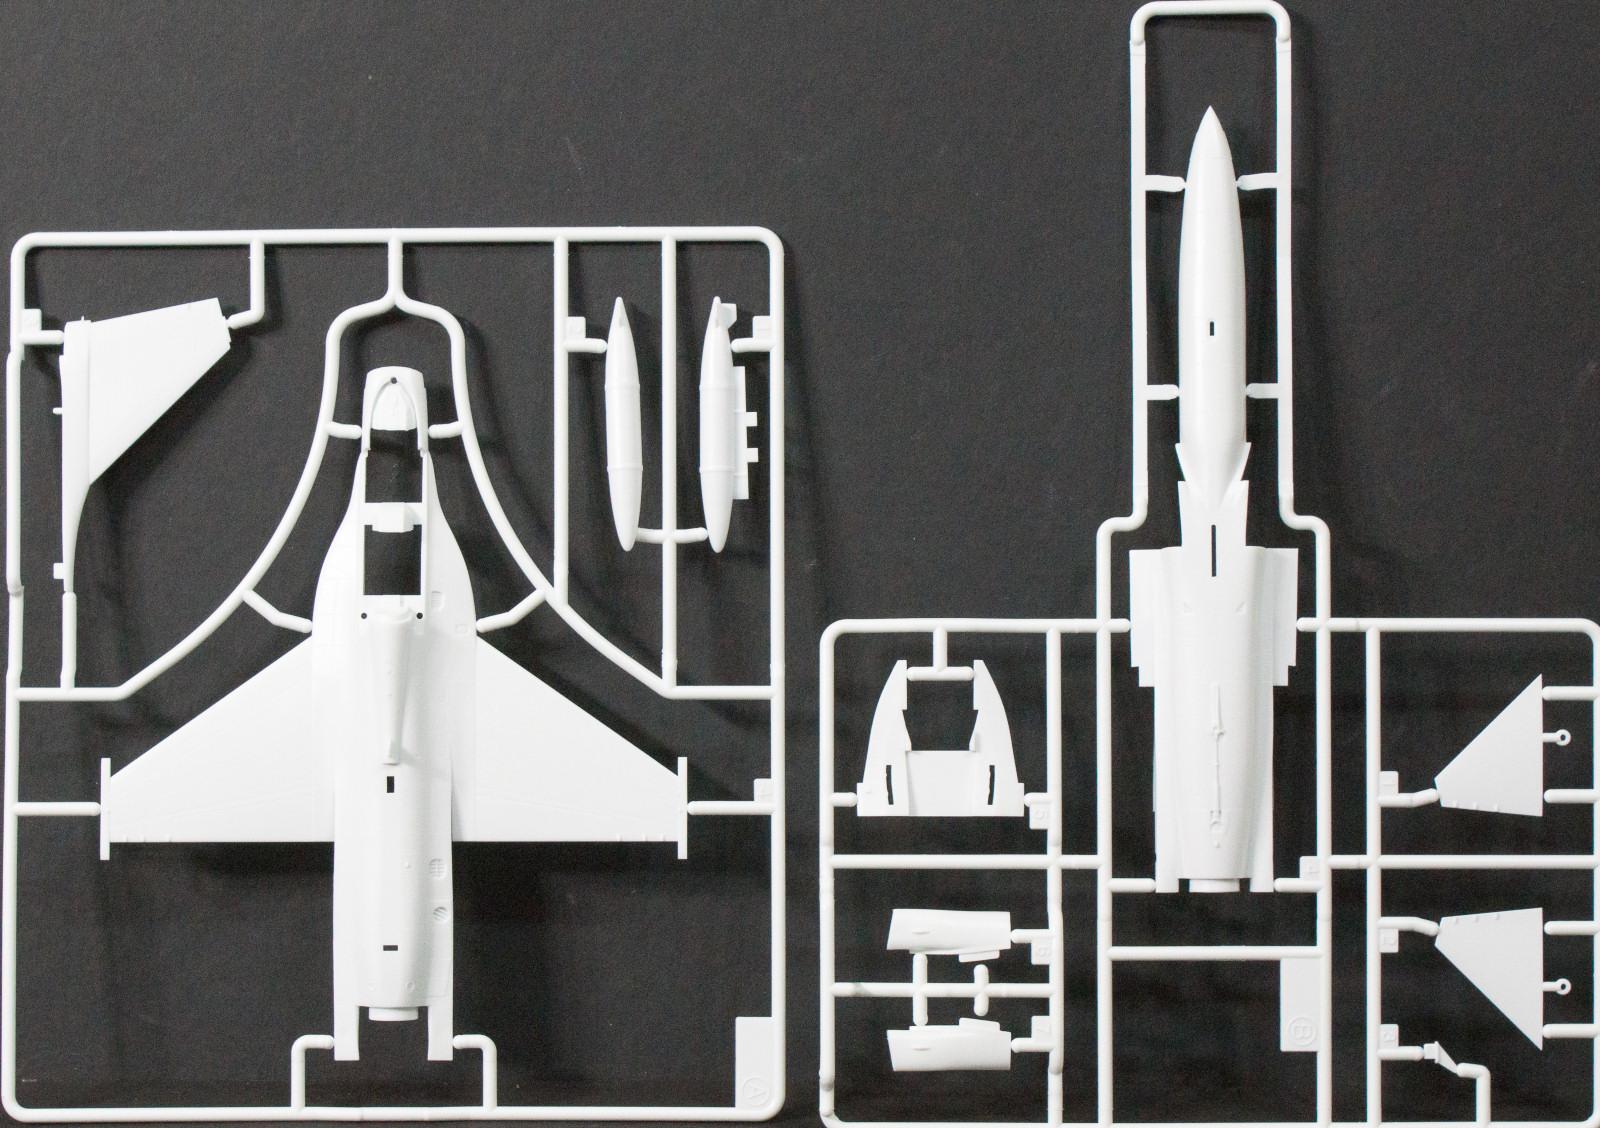 Academy 12519 1/72 KAI T-50 Golden Eagle Kit First Look